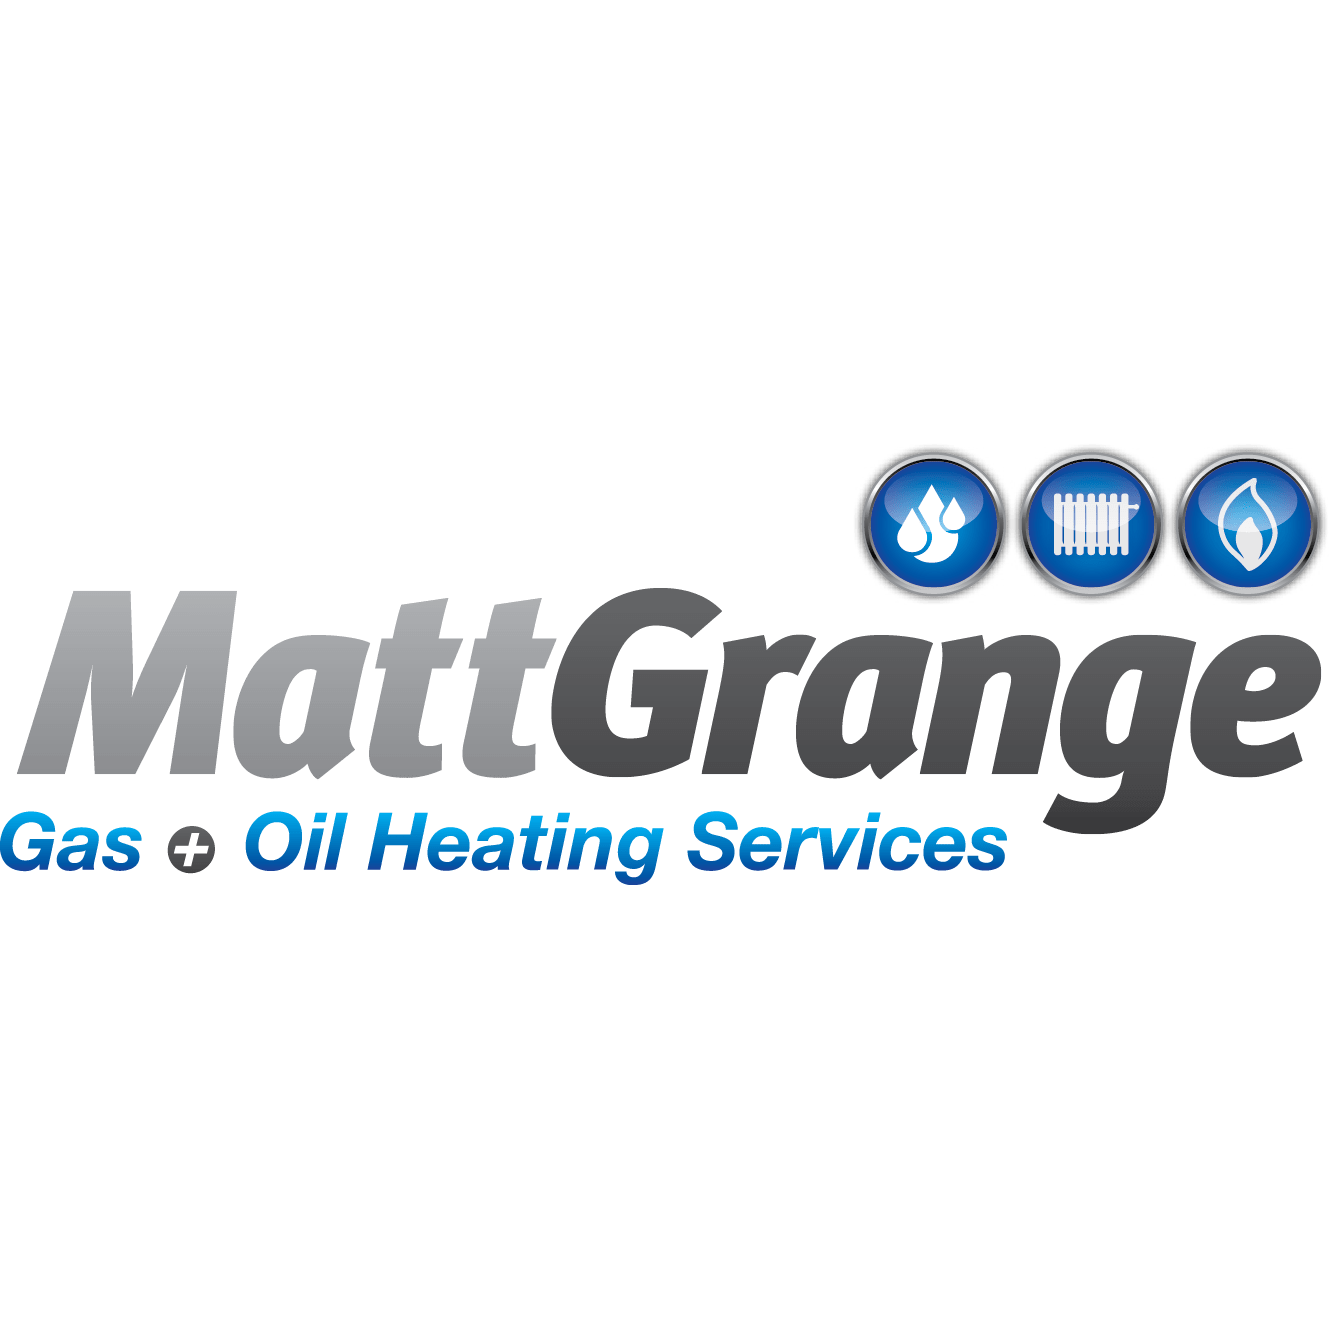 Matt Grange Gas & Oil Heating Services - Stockton-On-Tees, North Yorkshire TS19 1DW - 07773 786865   ShowMeLocal.com